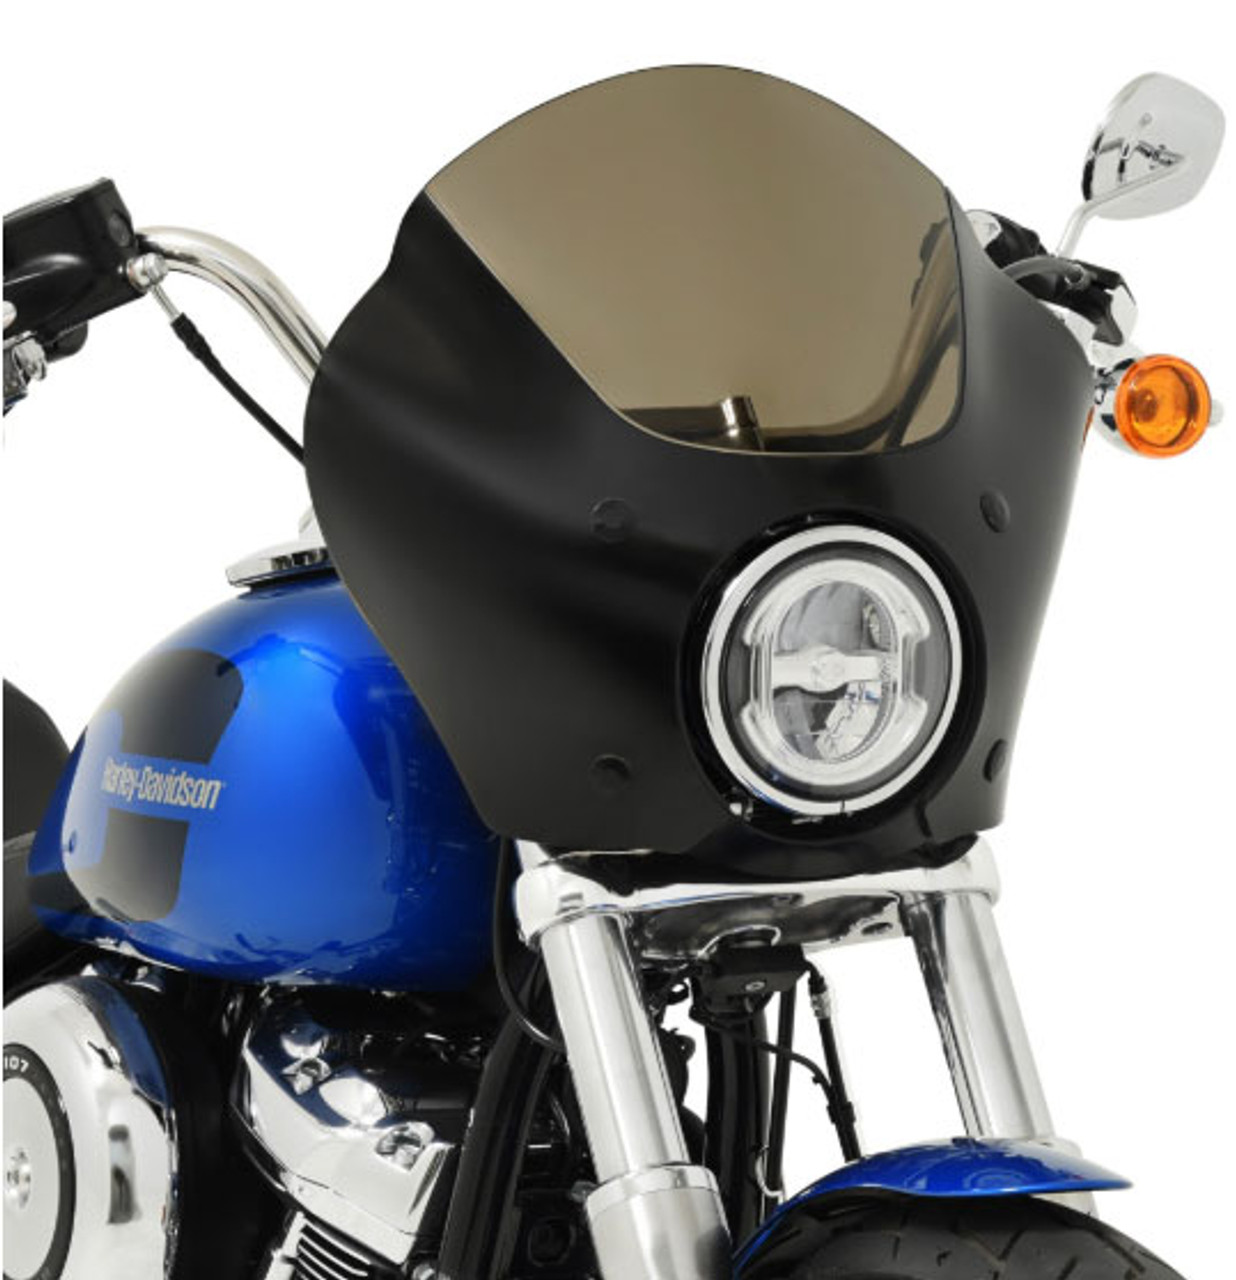 Memphis Shades Gauntlet Fairing for Harley Davidson ...